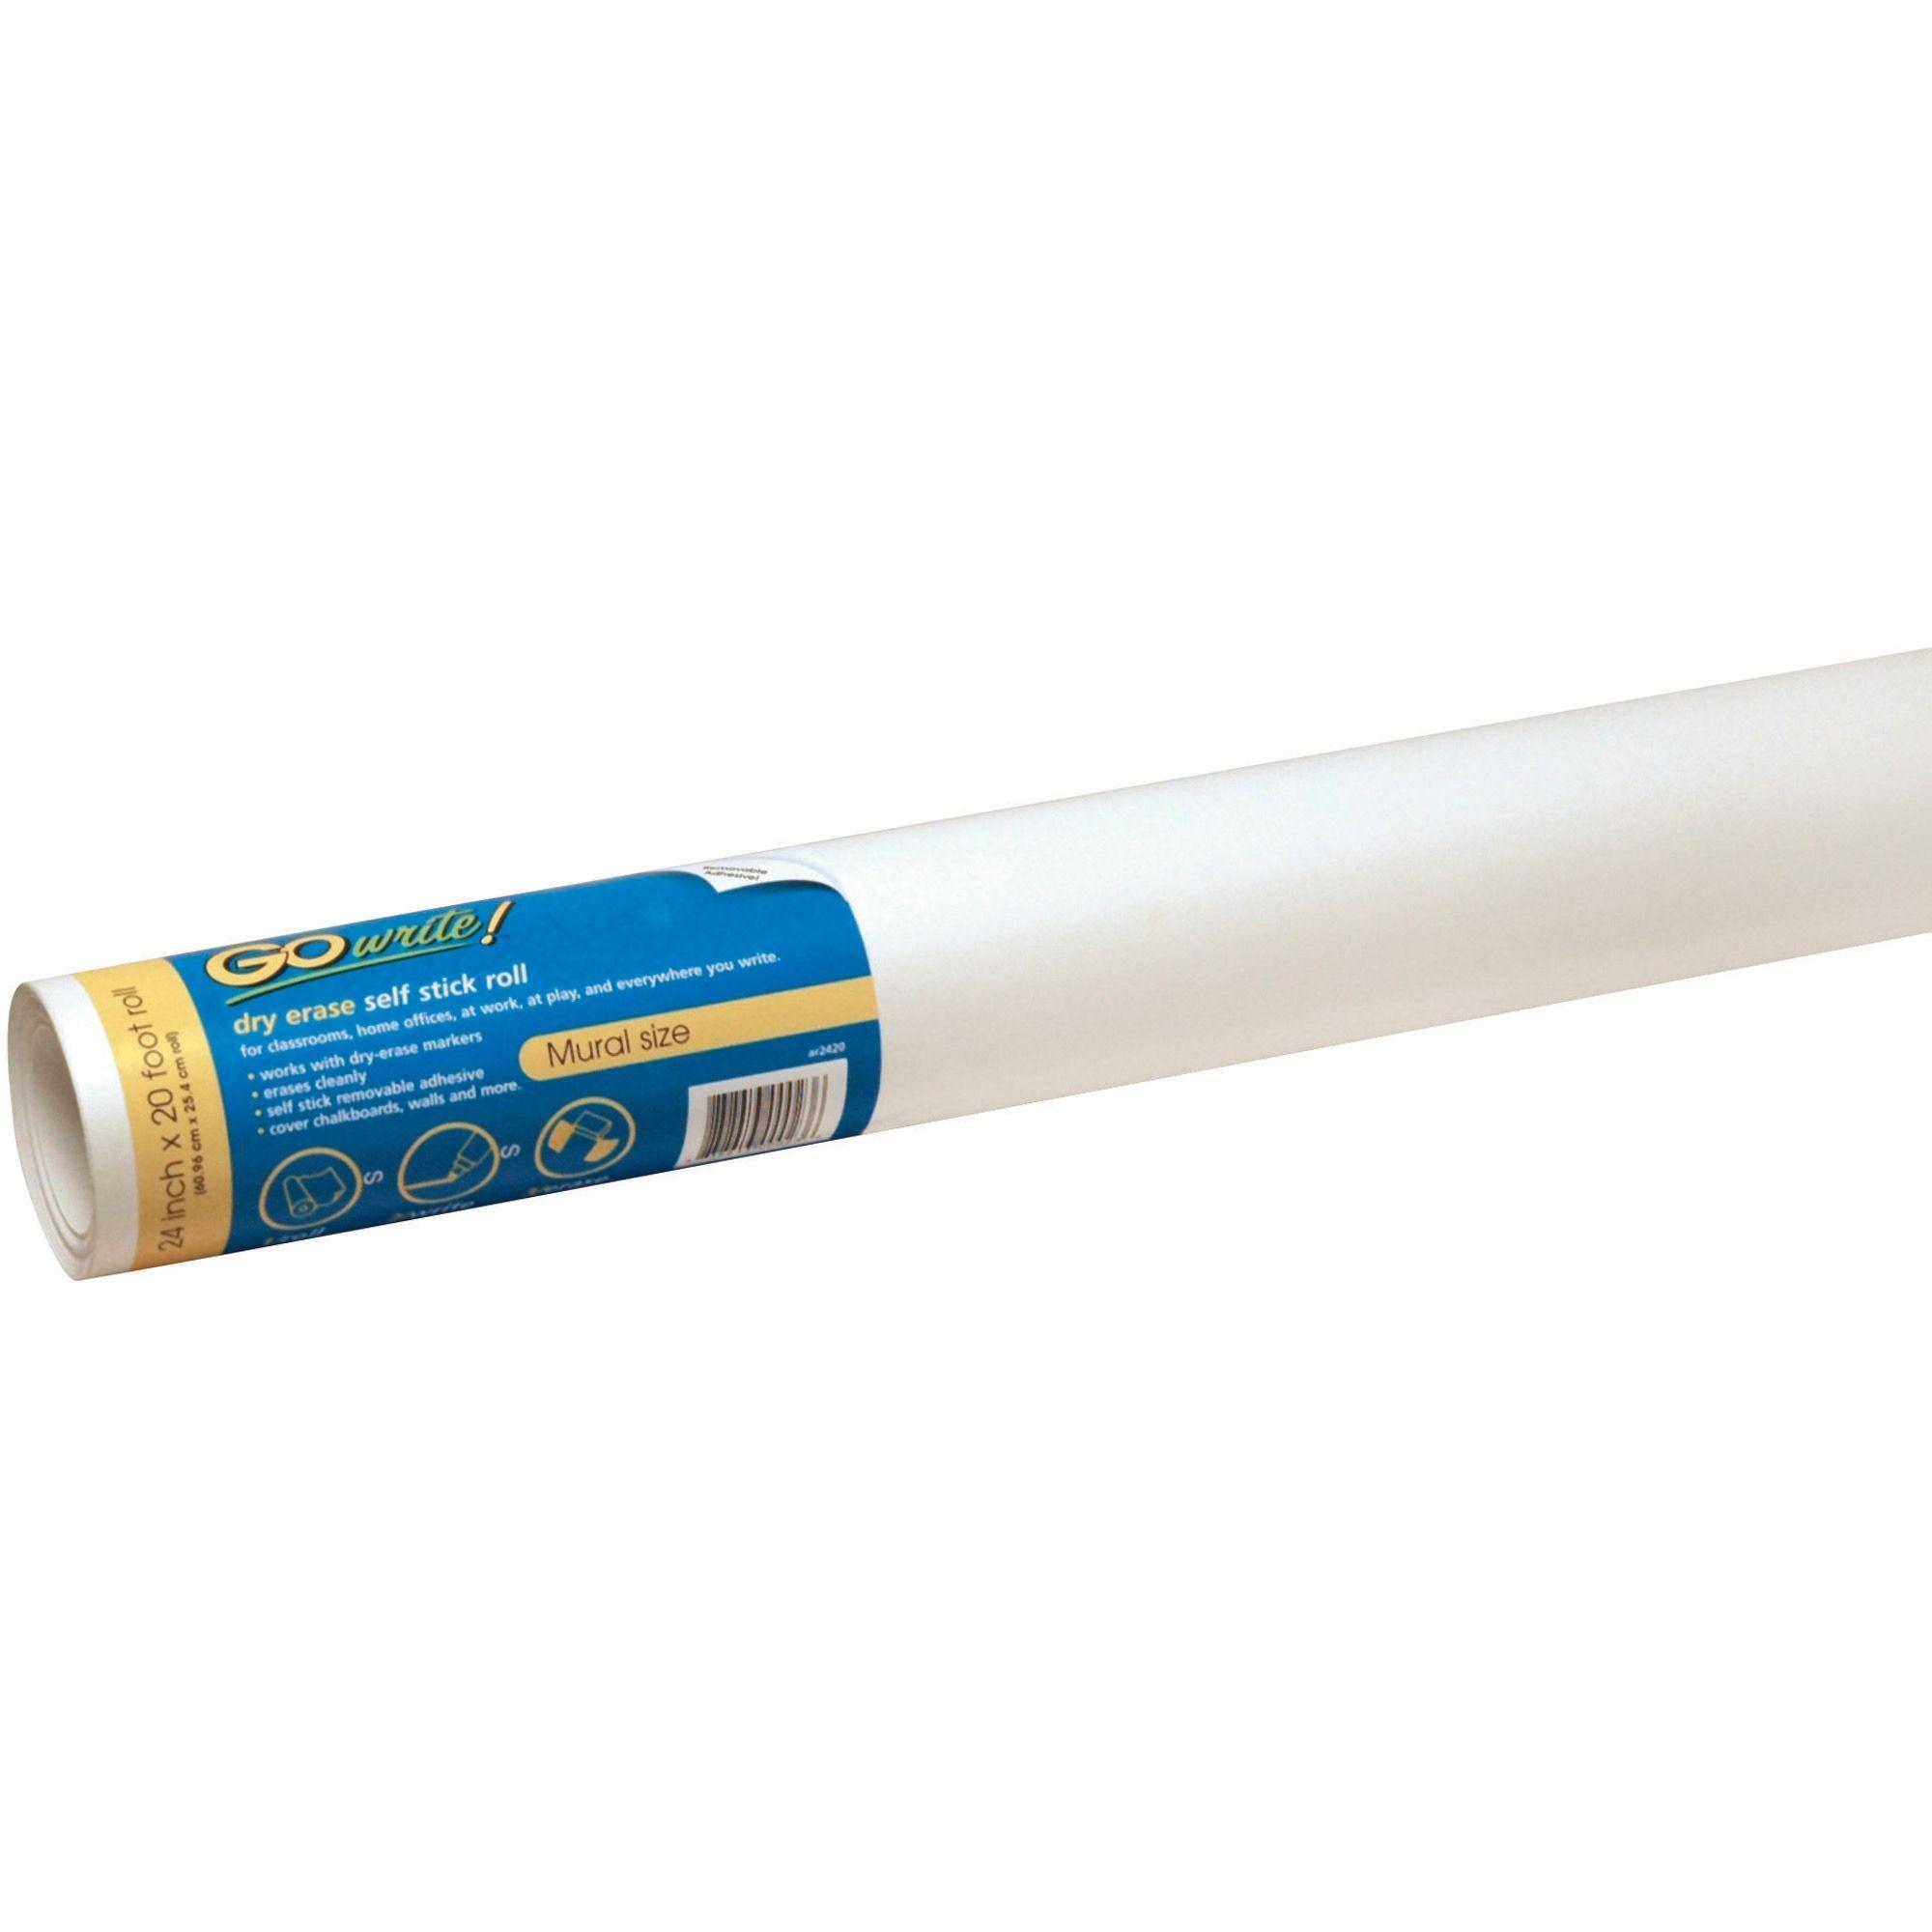 "GoWrite! SelfAdhesive Dry Erase Roll, White, 24"" x 20', 1"